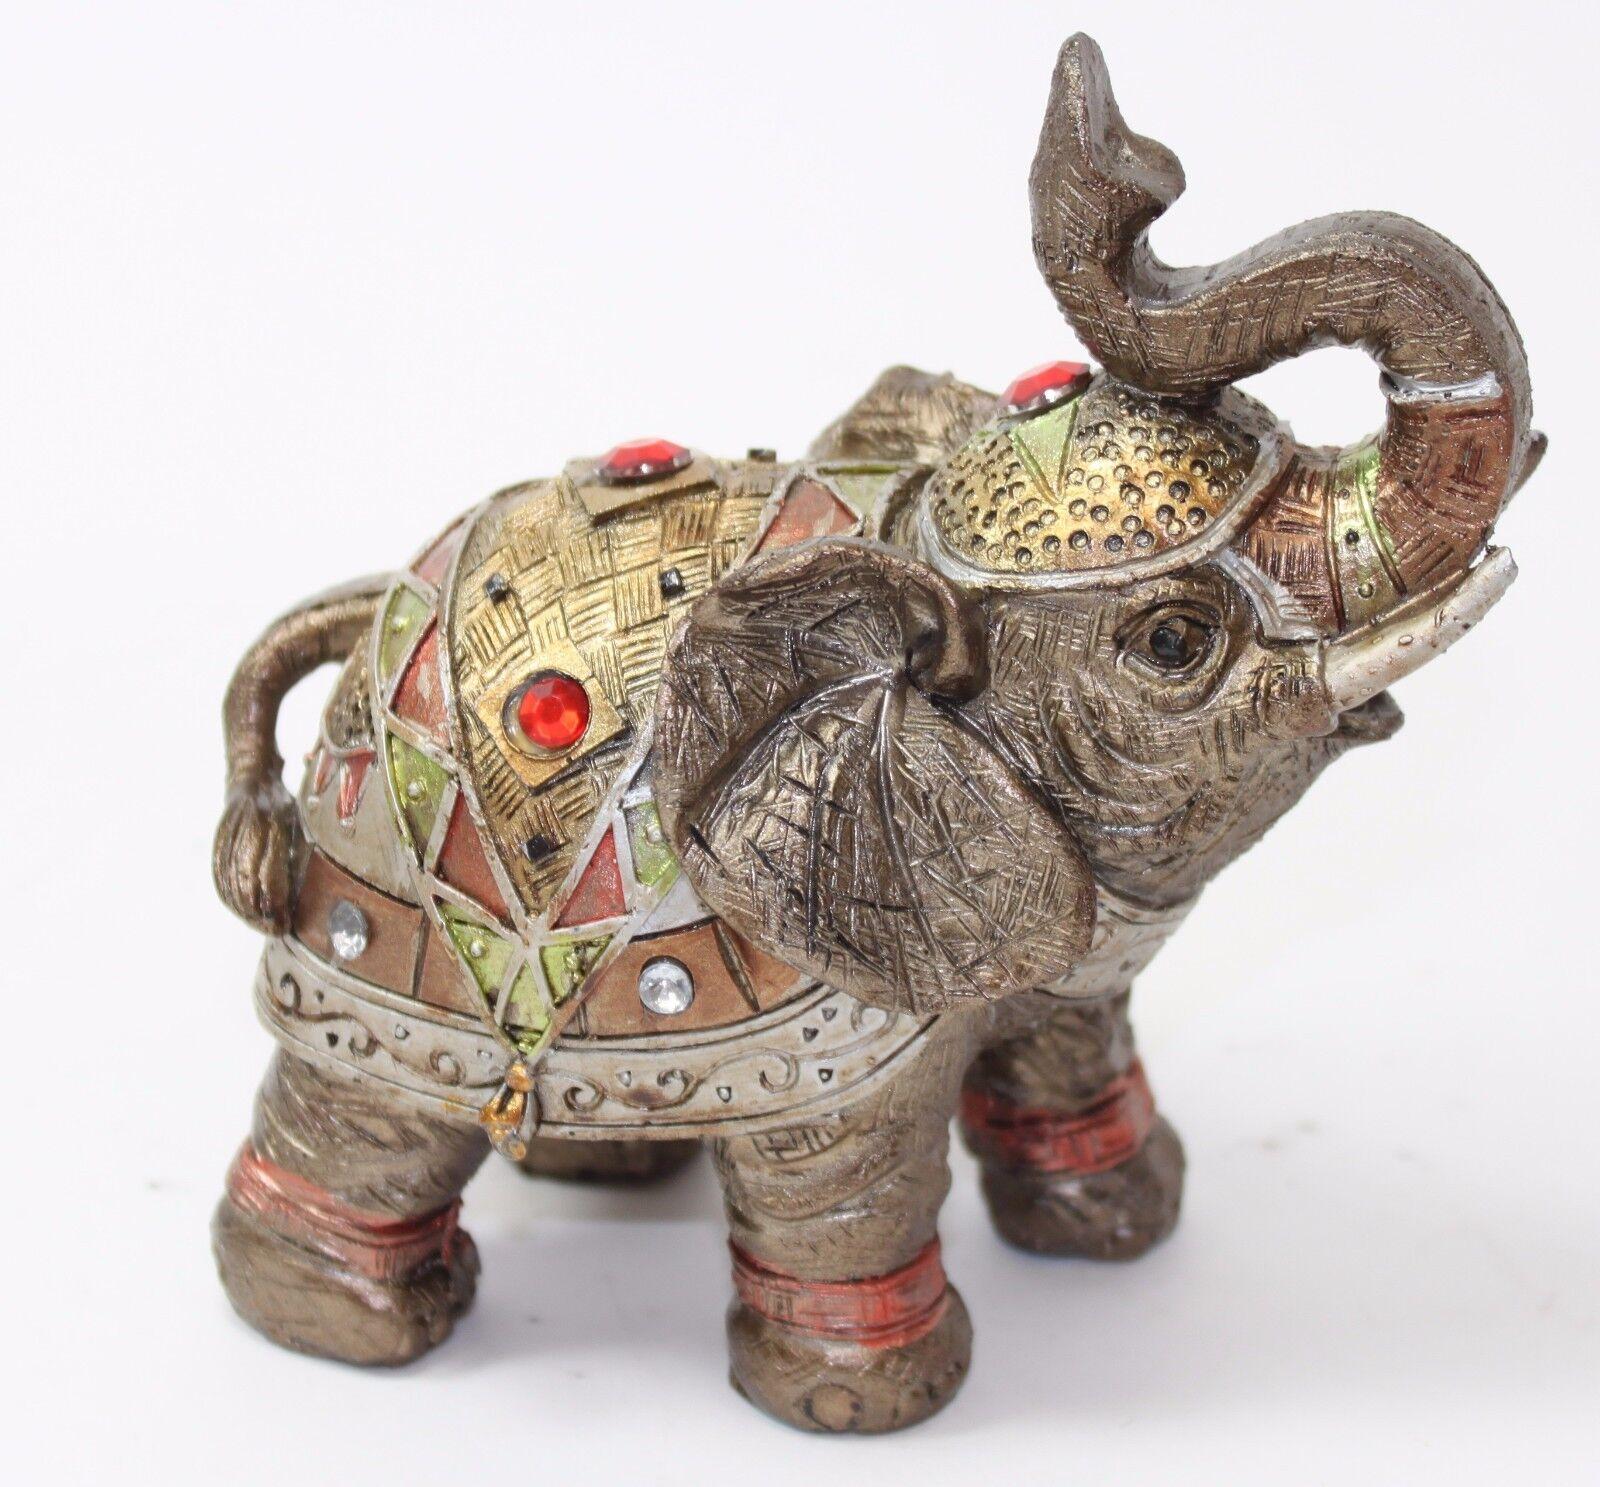 feng shui 5 bronze elephant figurine wealth lucky figurine gift home decor ebay. Black Bedroom Furniture Sets. Home Design Ideas